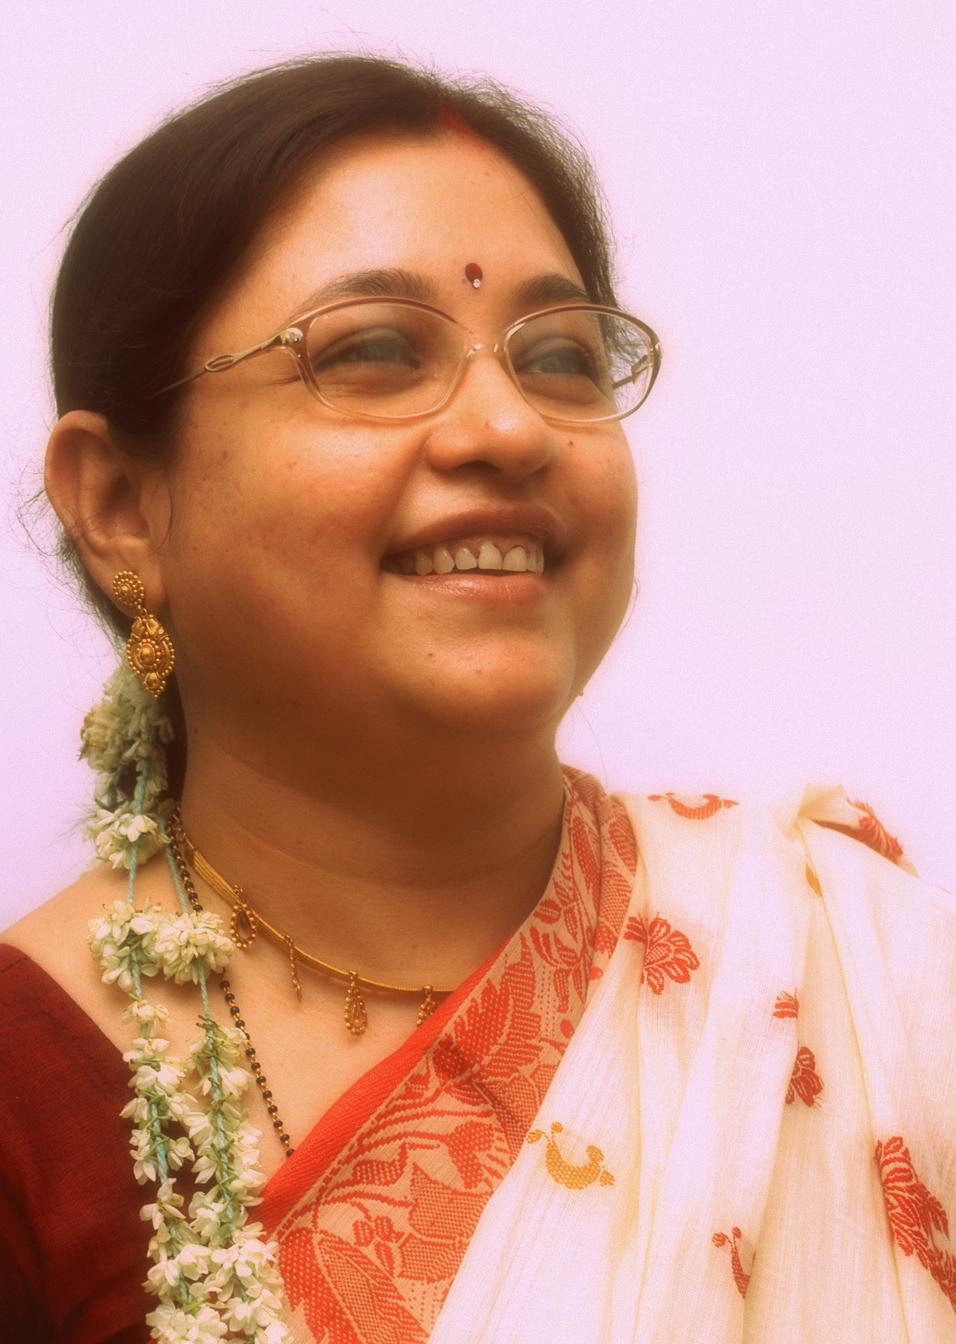 Check out my writings at my blog http://sahasangeeta17.blogspot.com